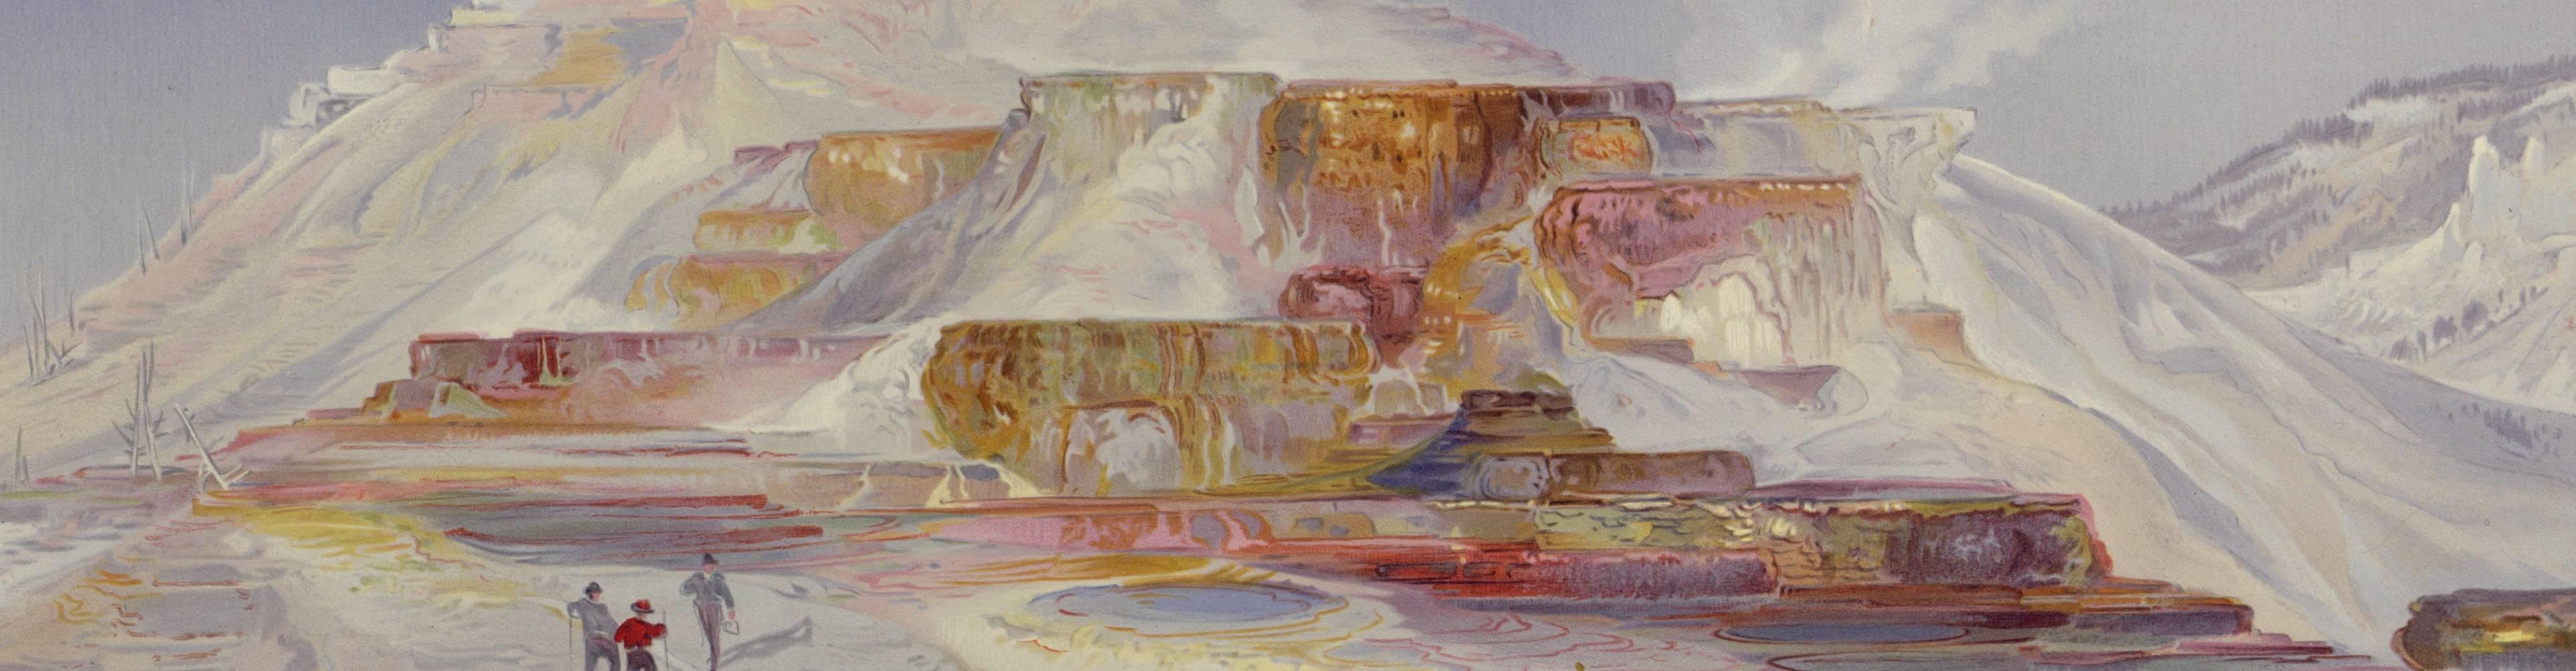 virmuze exhibit Hayden and the Birth Of Yellowstone logo main banner